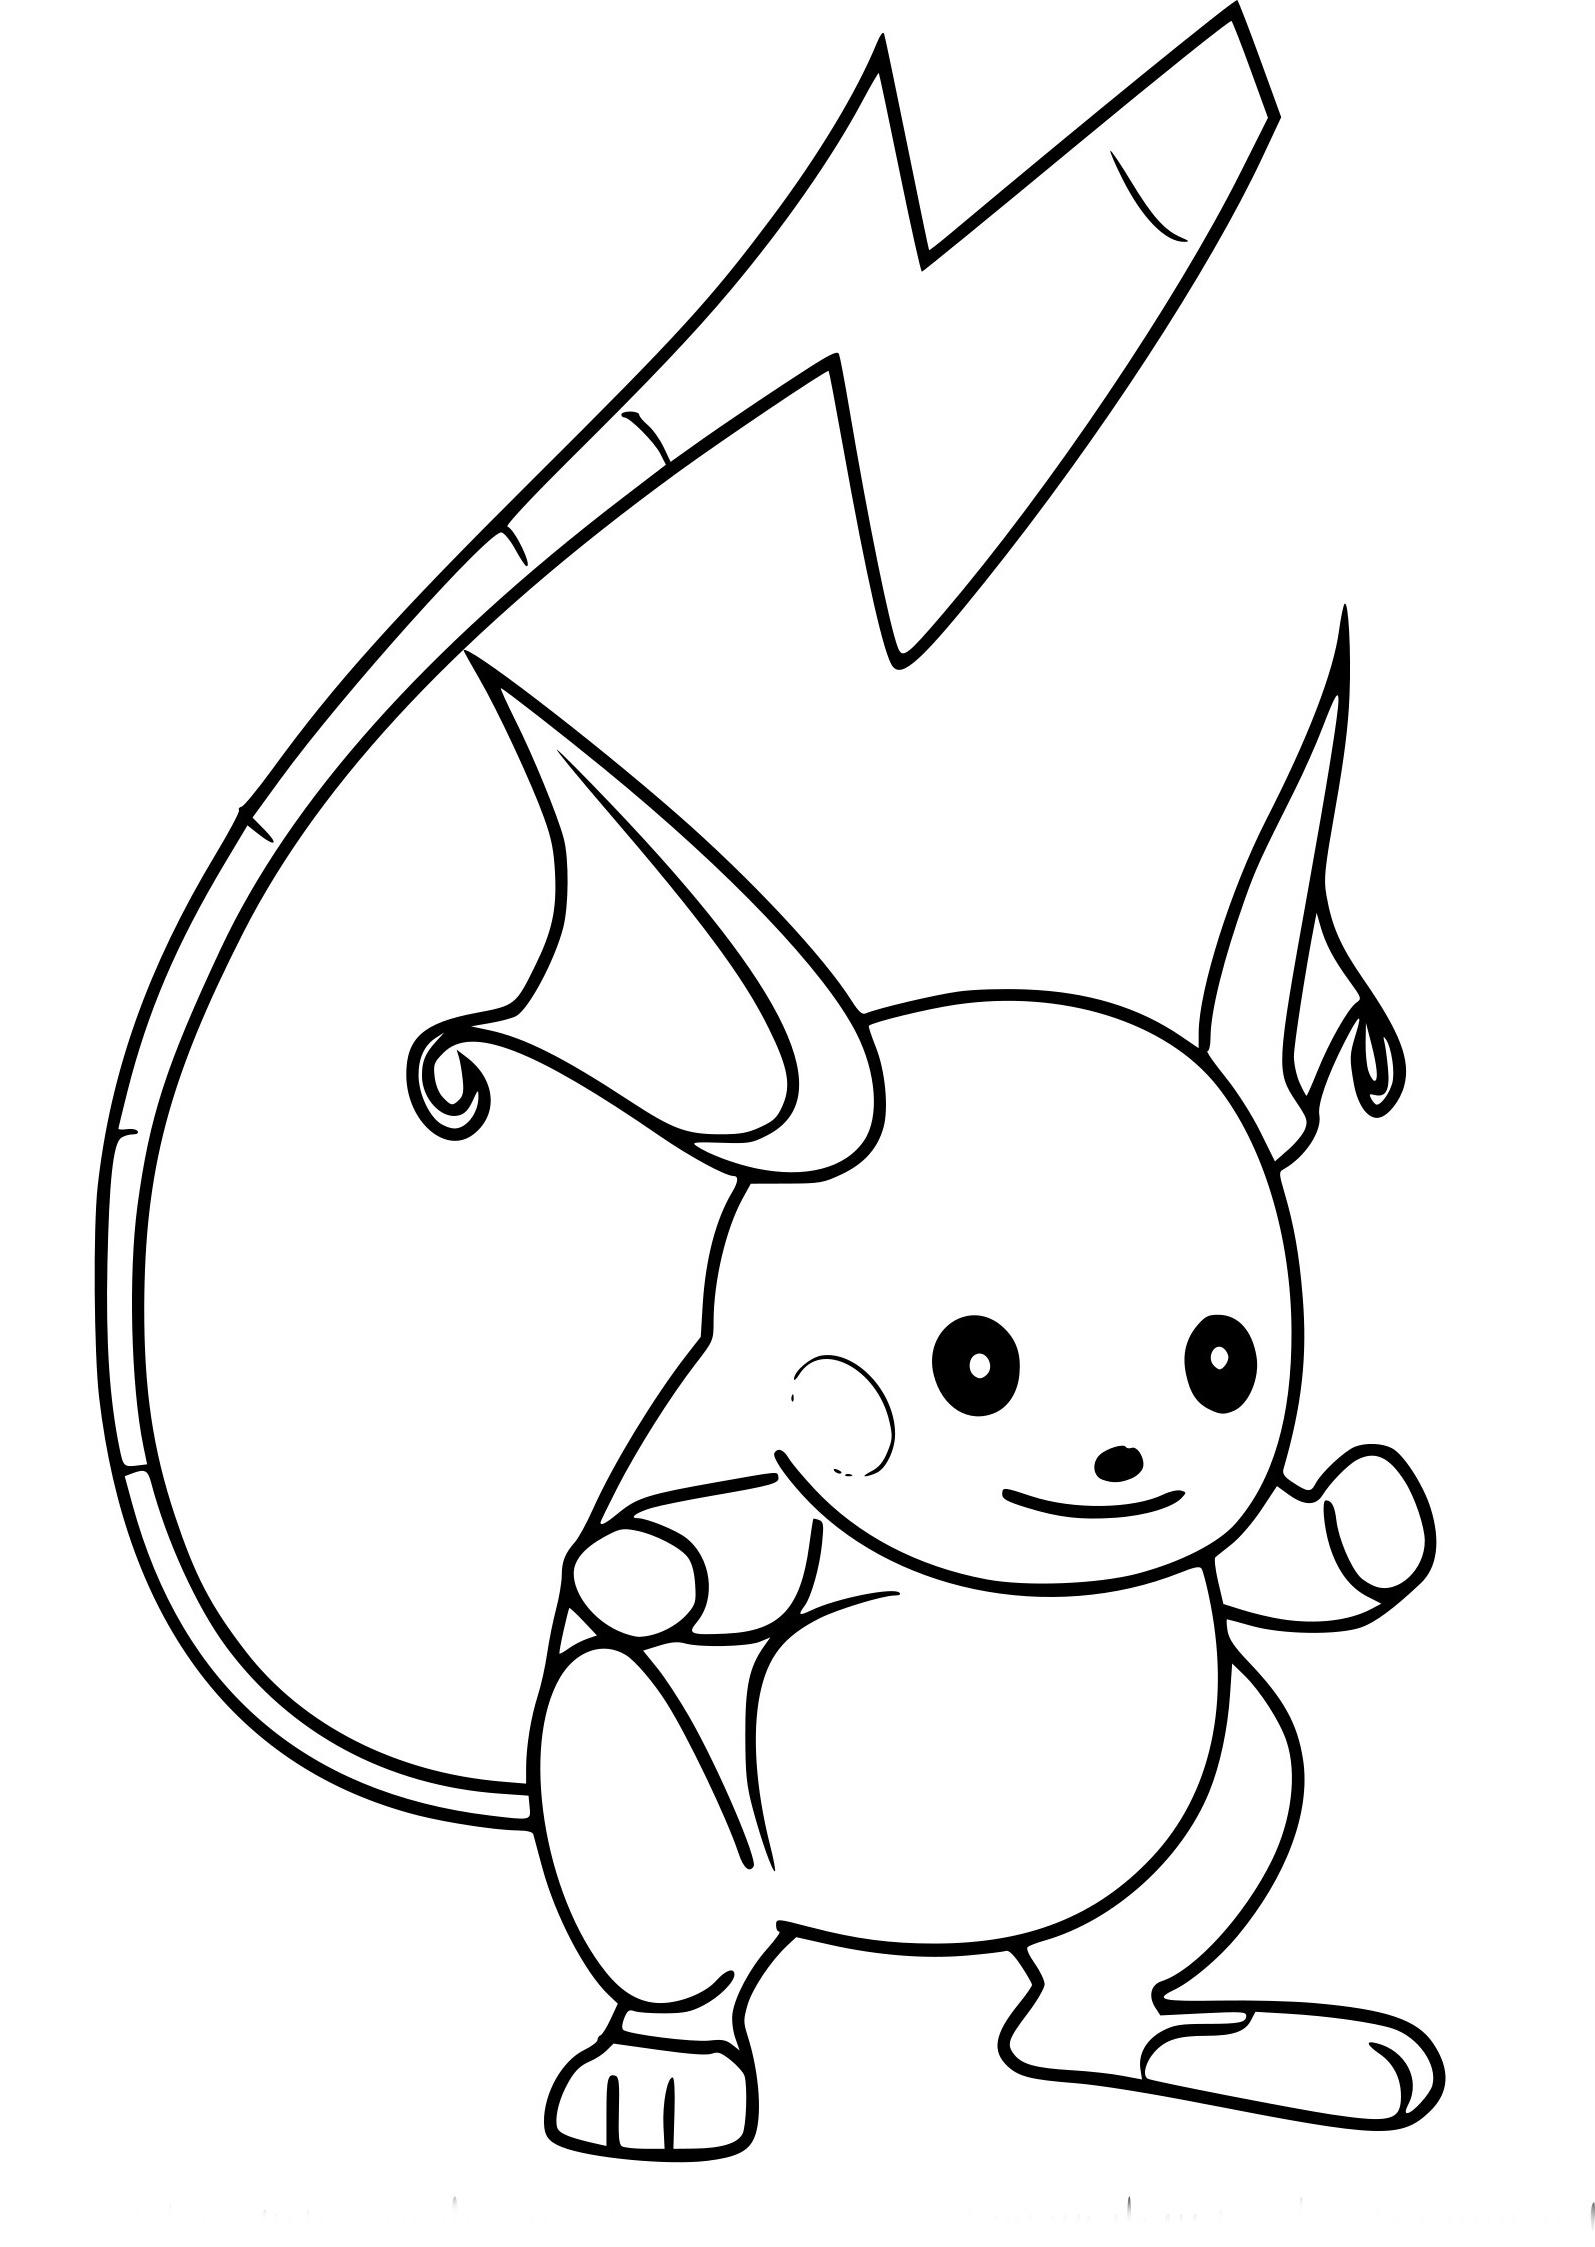 Coloriage Raichu Beau Stock Coloriage Raichu Pokemon Go À avec Coloriage Pokemon Raichu